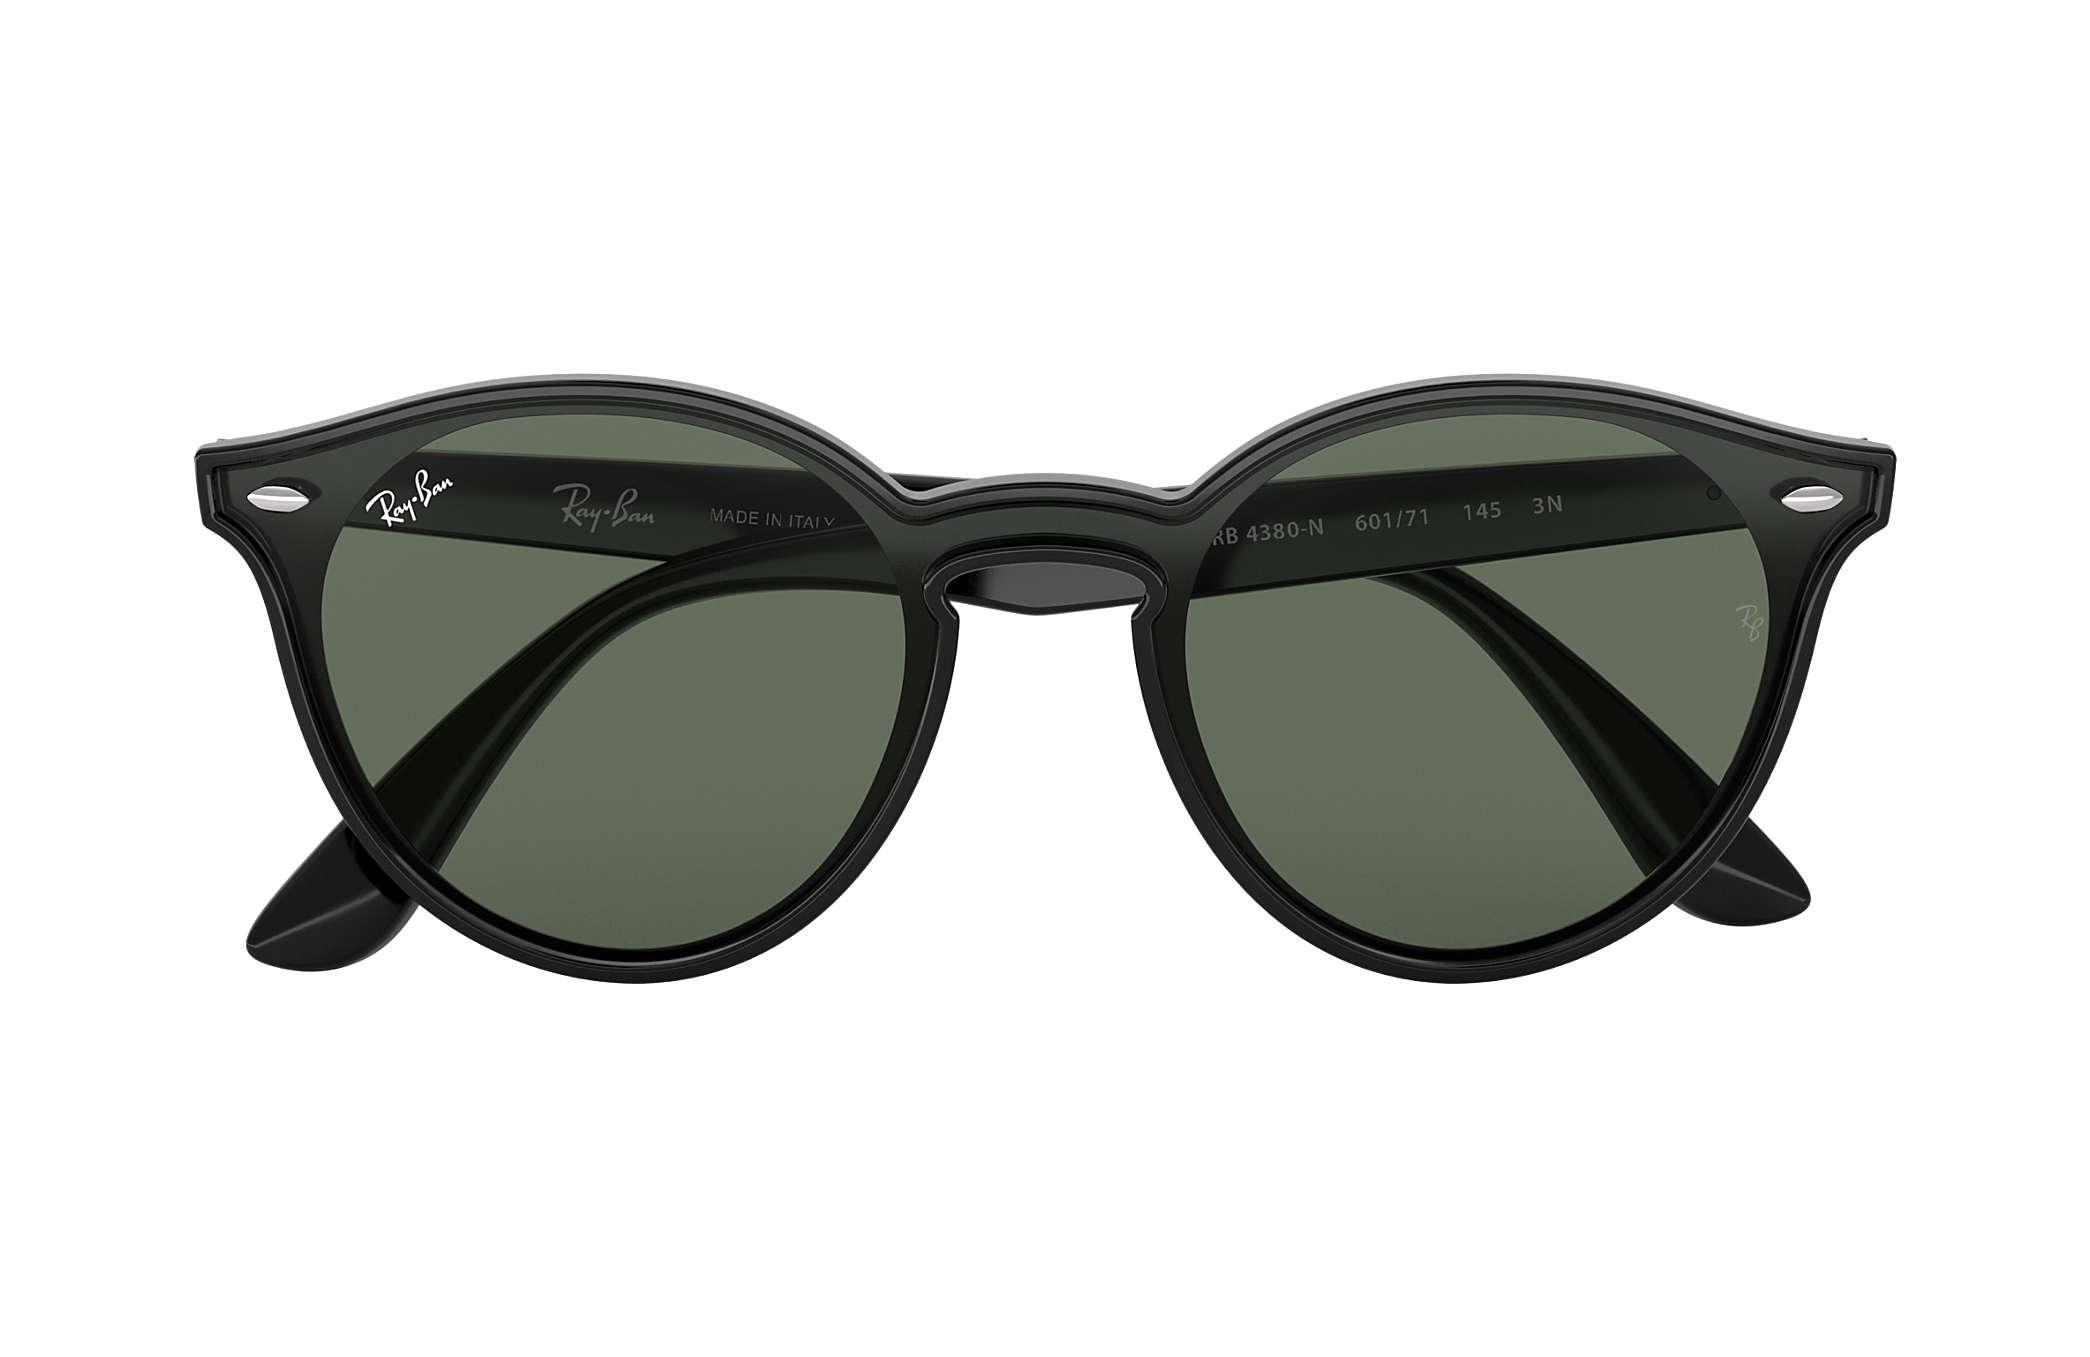 53160369fcffb Ray-Ban Blaze Rb4380n RB4380N Black - Nylon - Green Lenses ...